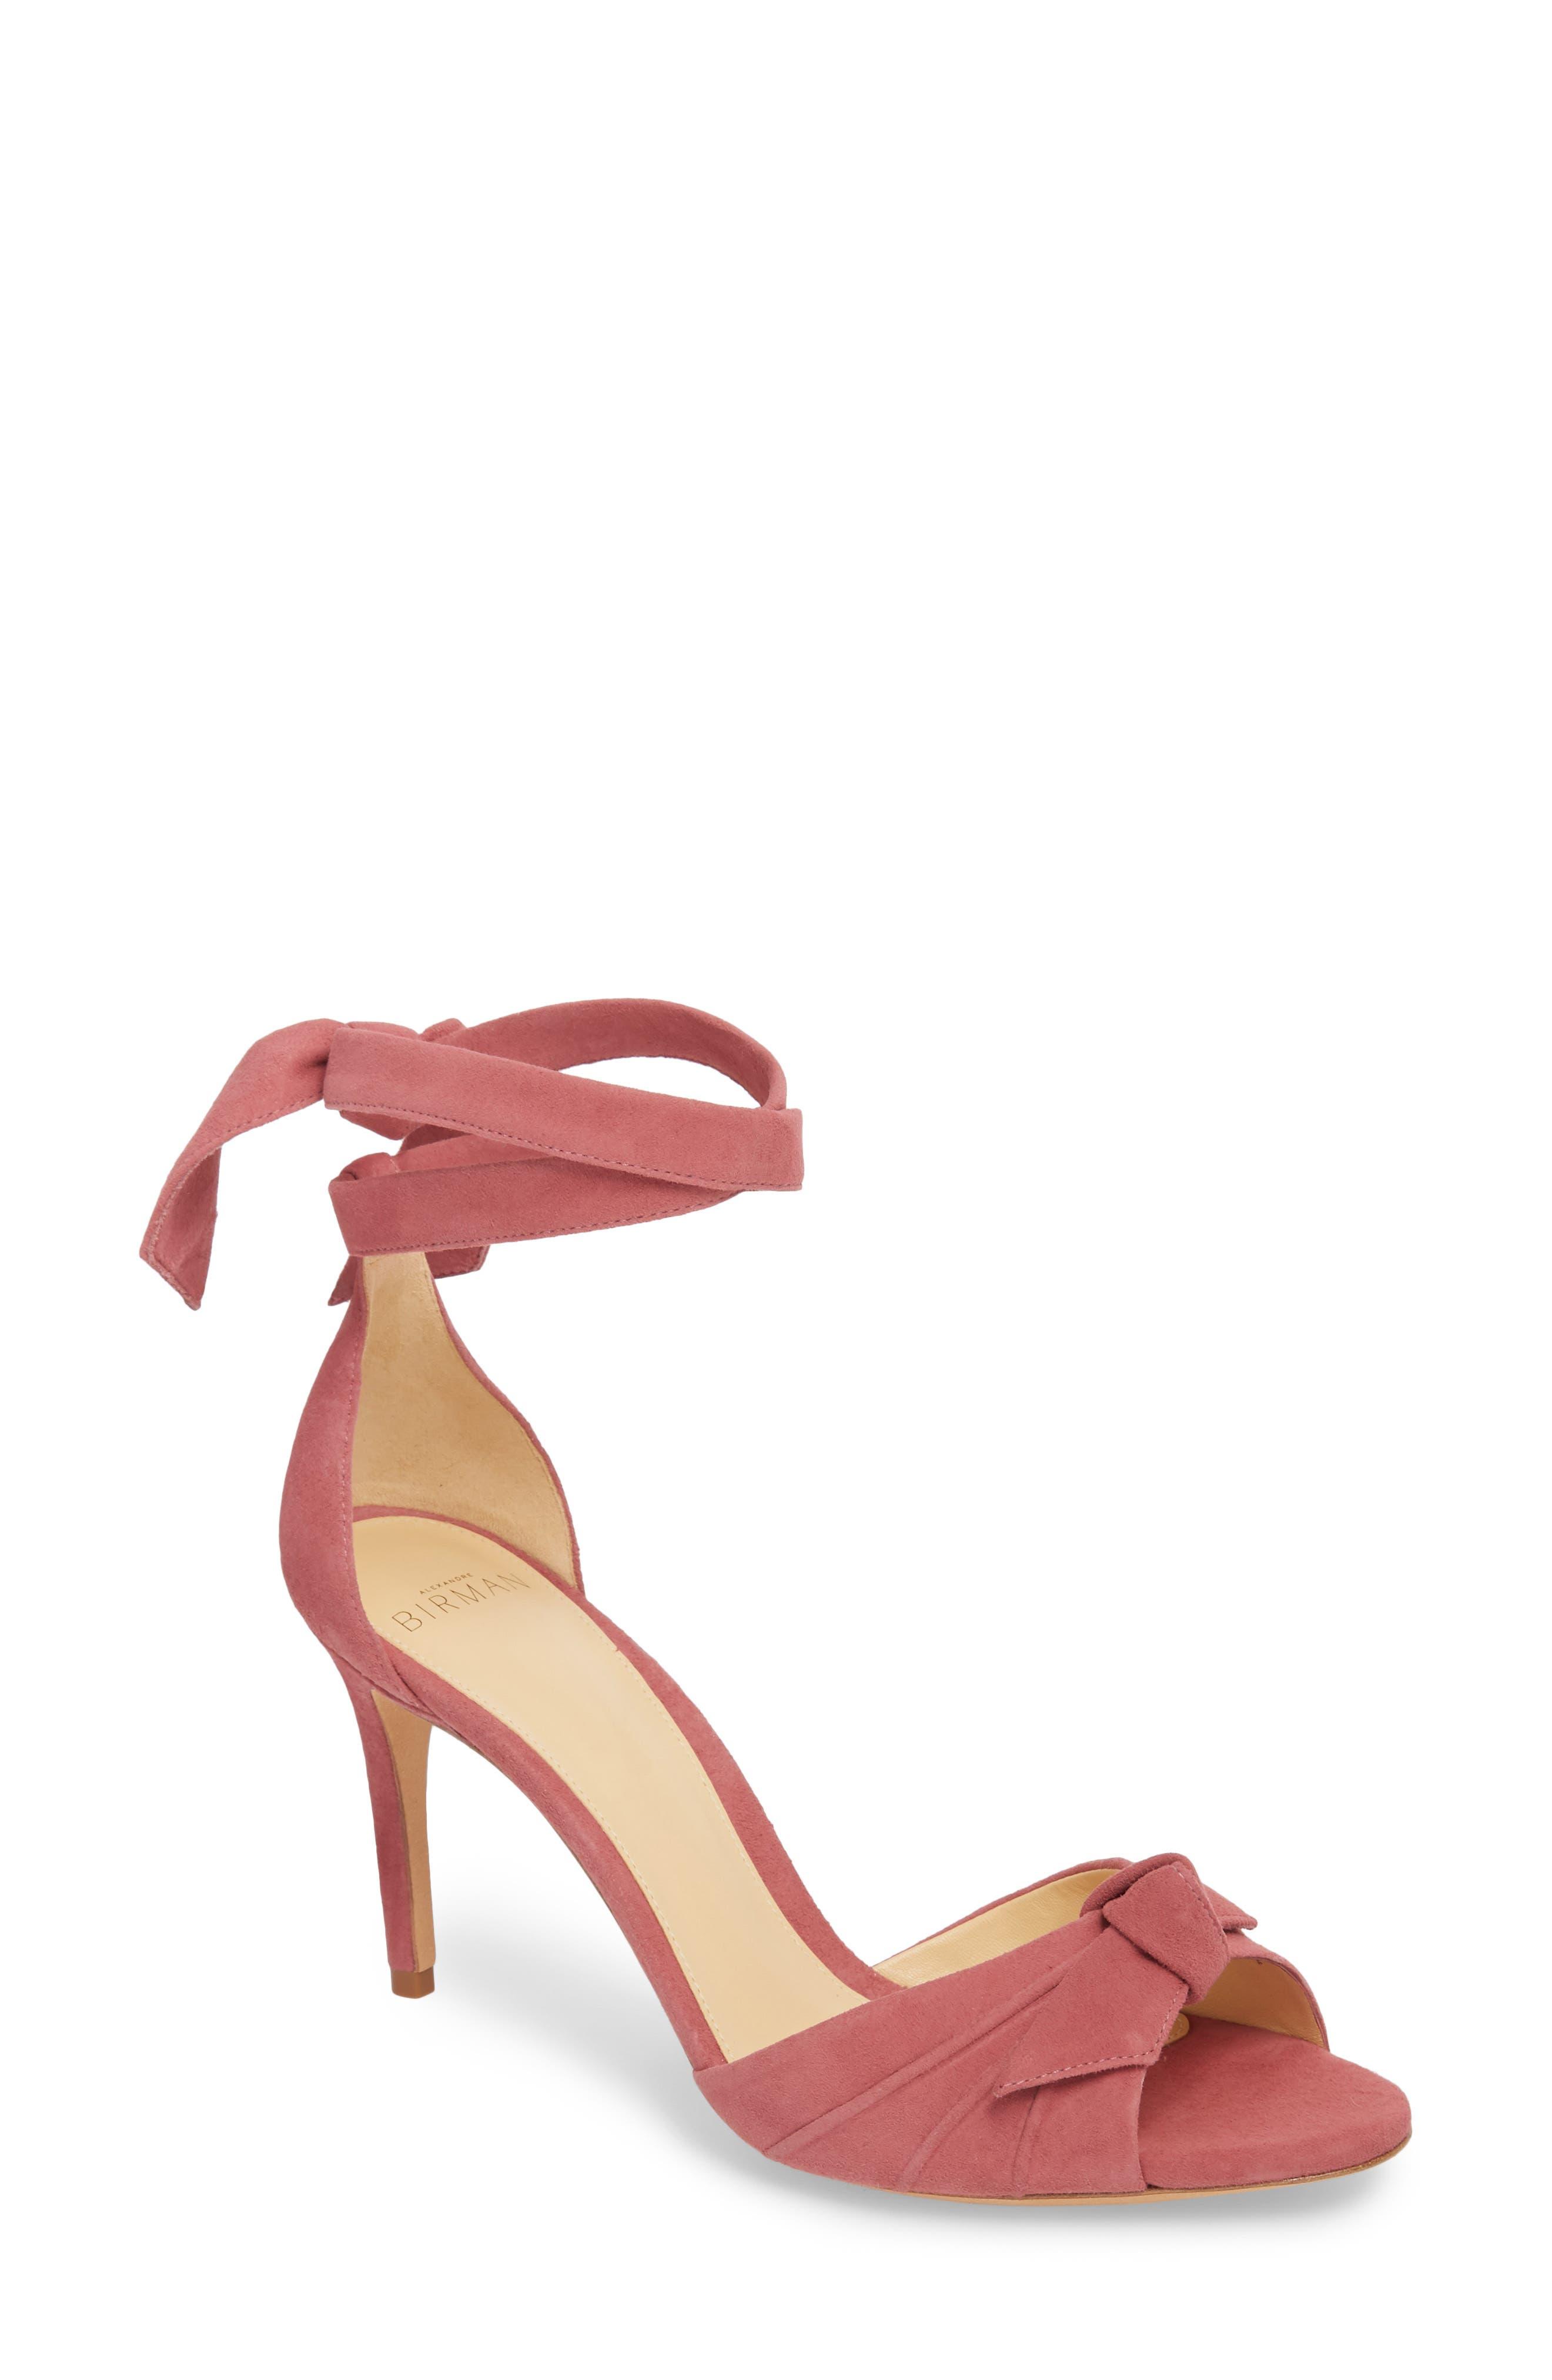 Clarita Ankle Tie Sandal,                         Main,                         color, Dusty Rose